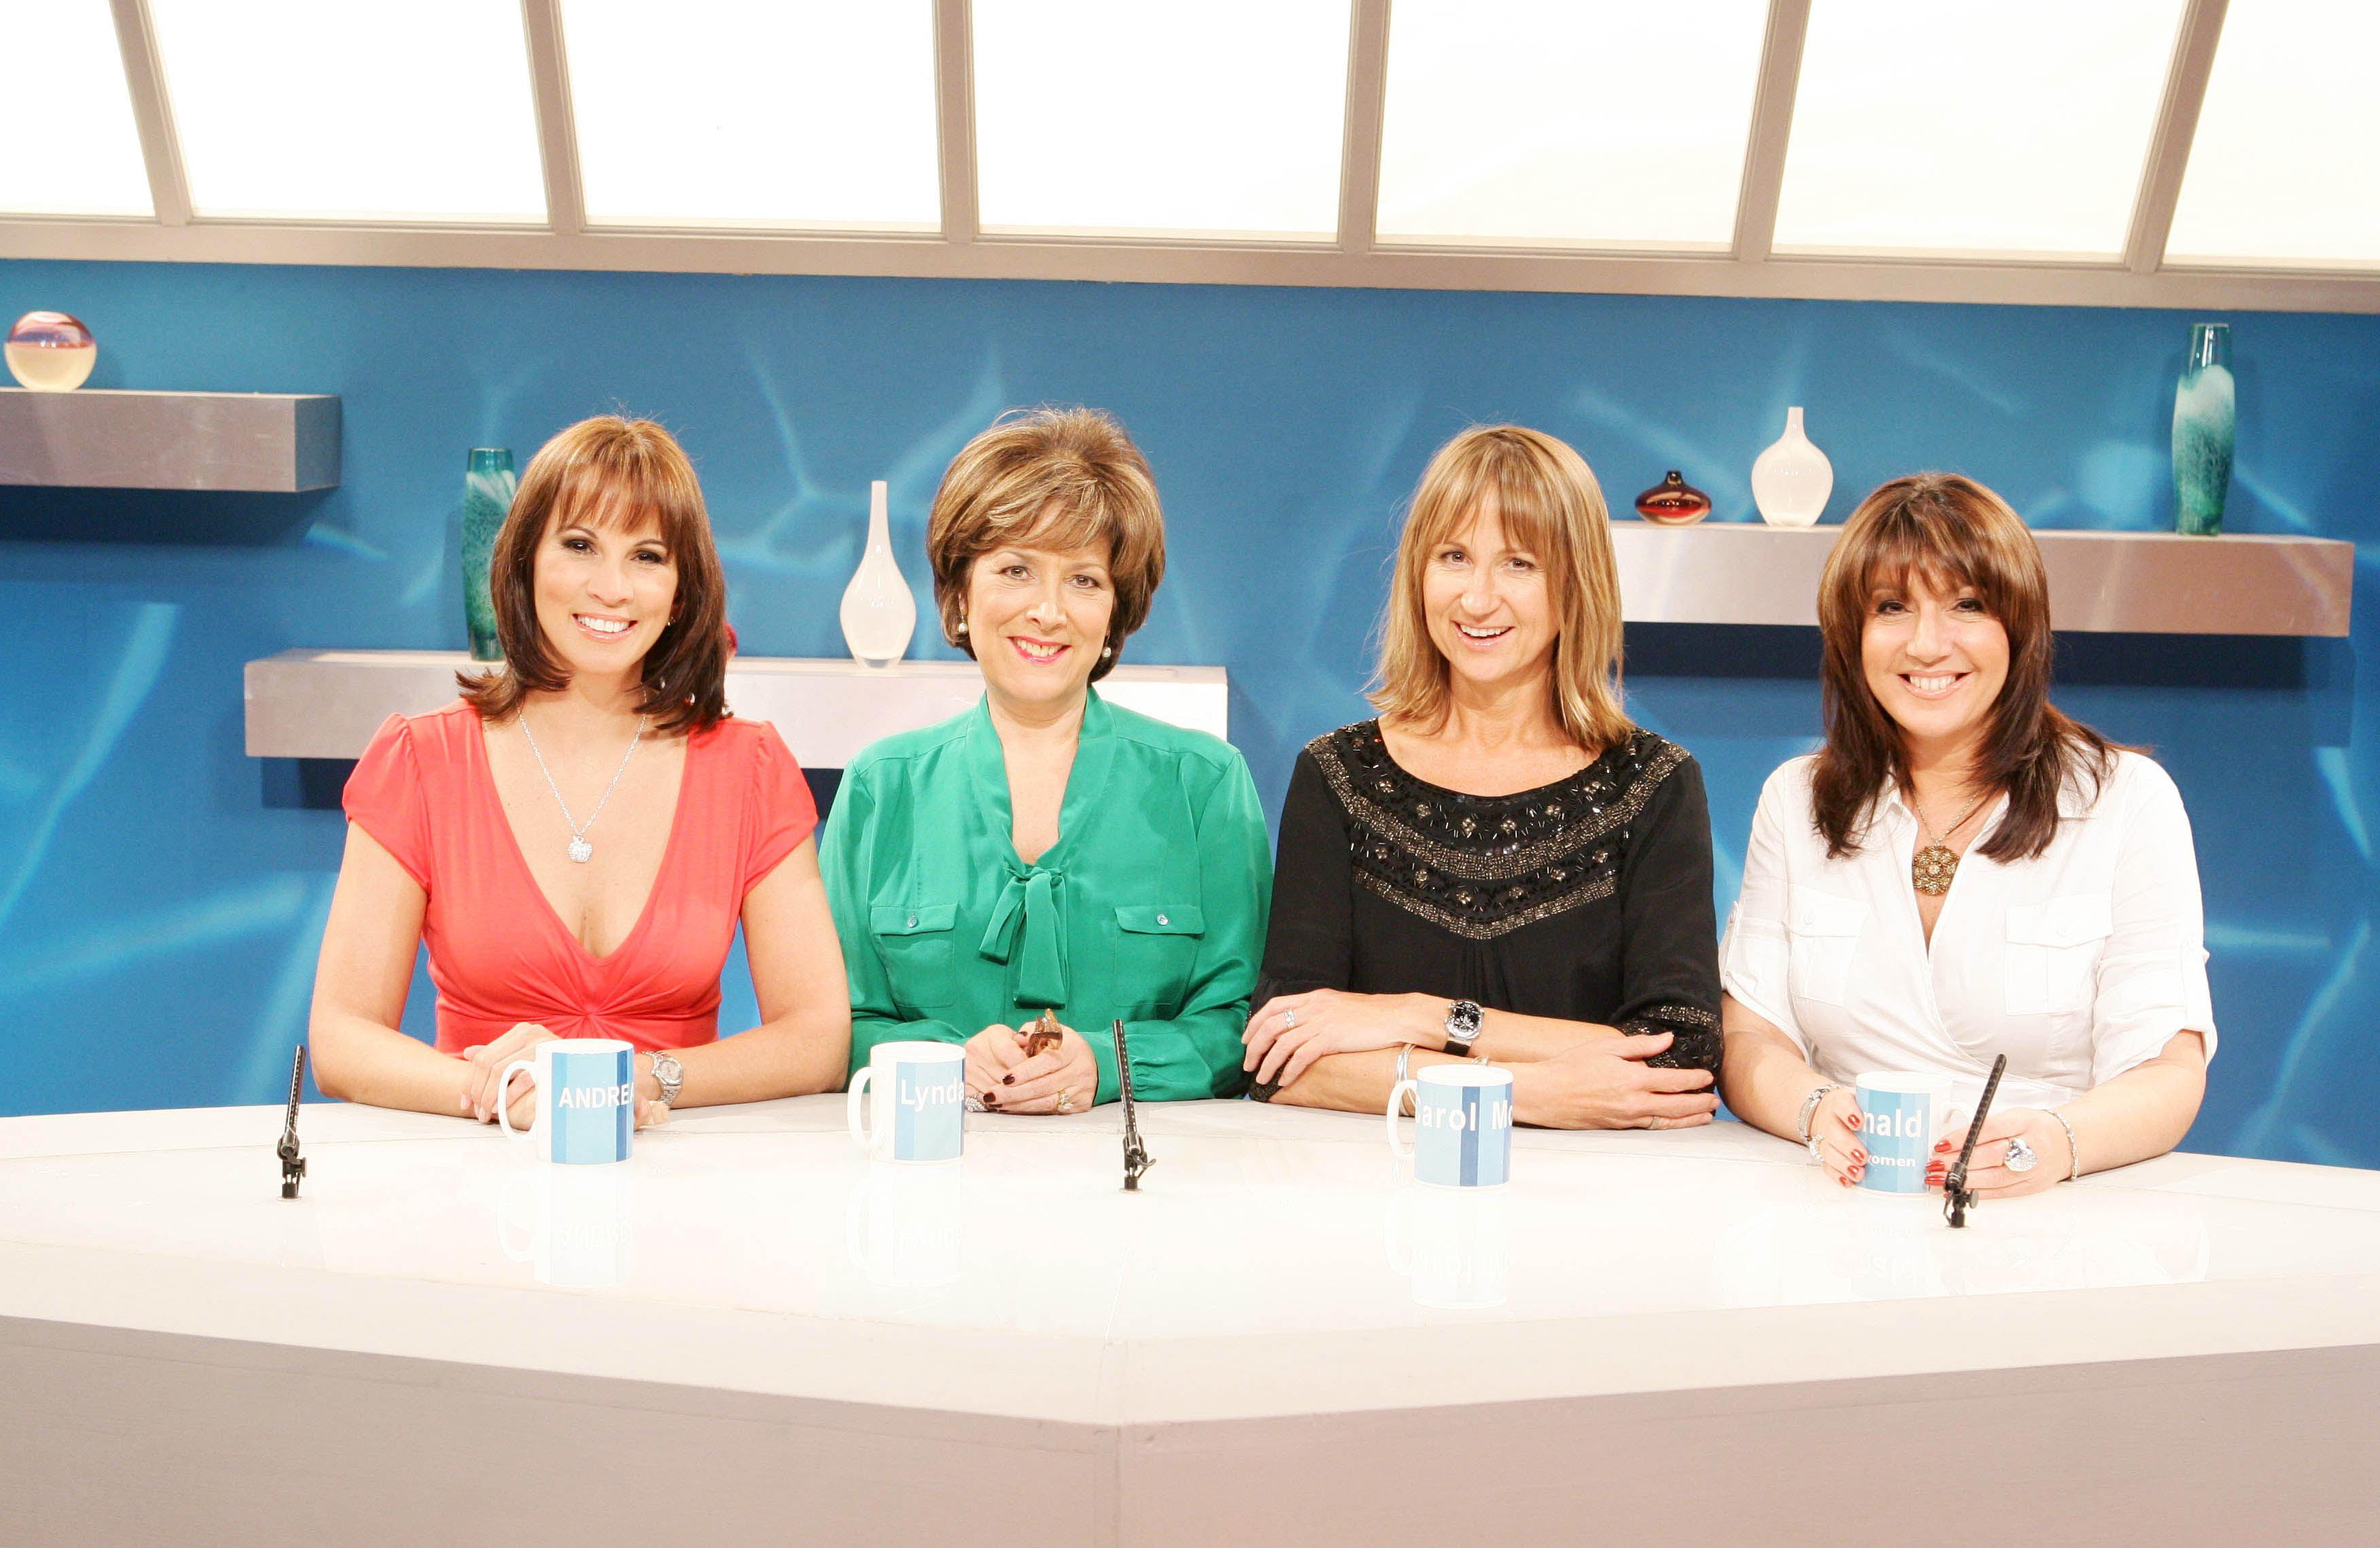 'Loose Women' TV - 2008 - [l-r]: Andrea McLean, Lynda Bellingham, Carol McGiffin and Jane McDonald. ITV ARCHIVE